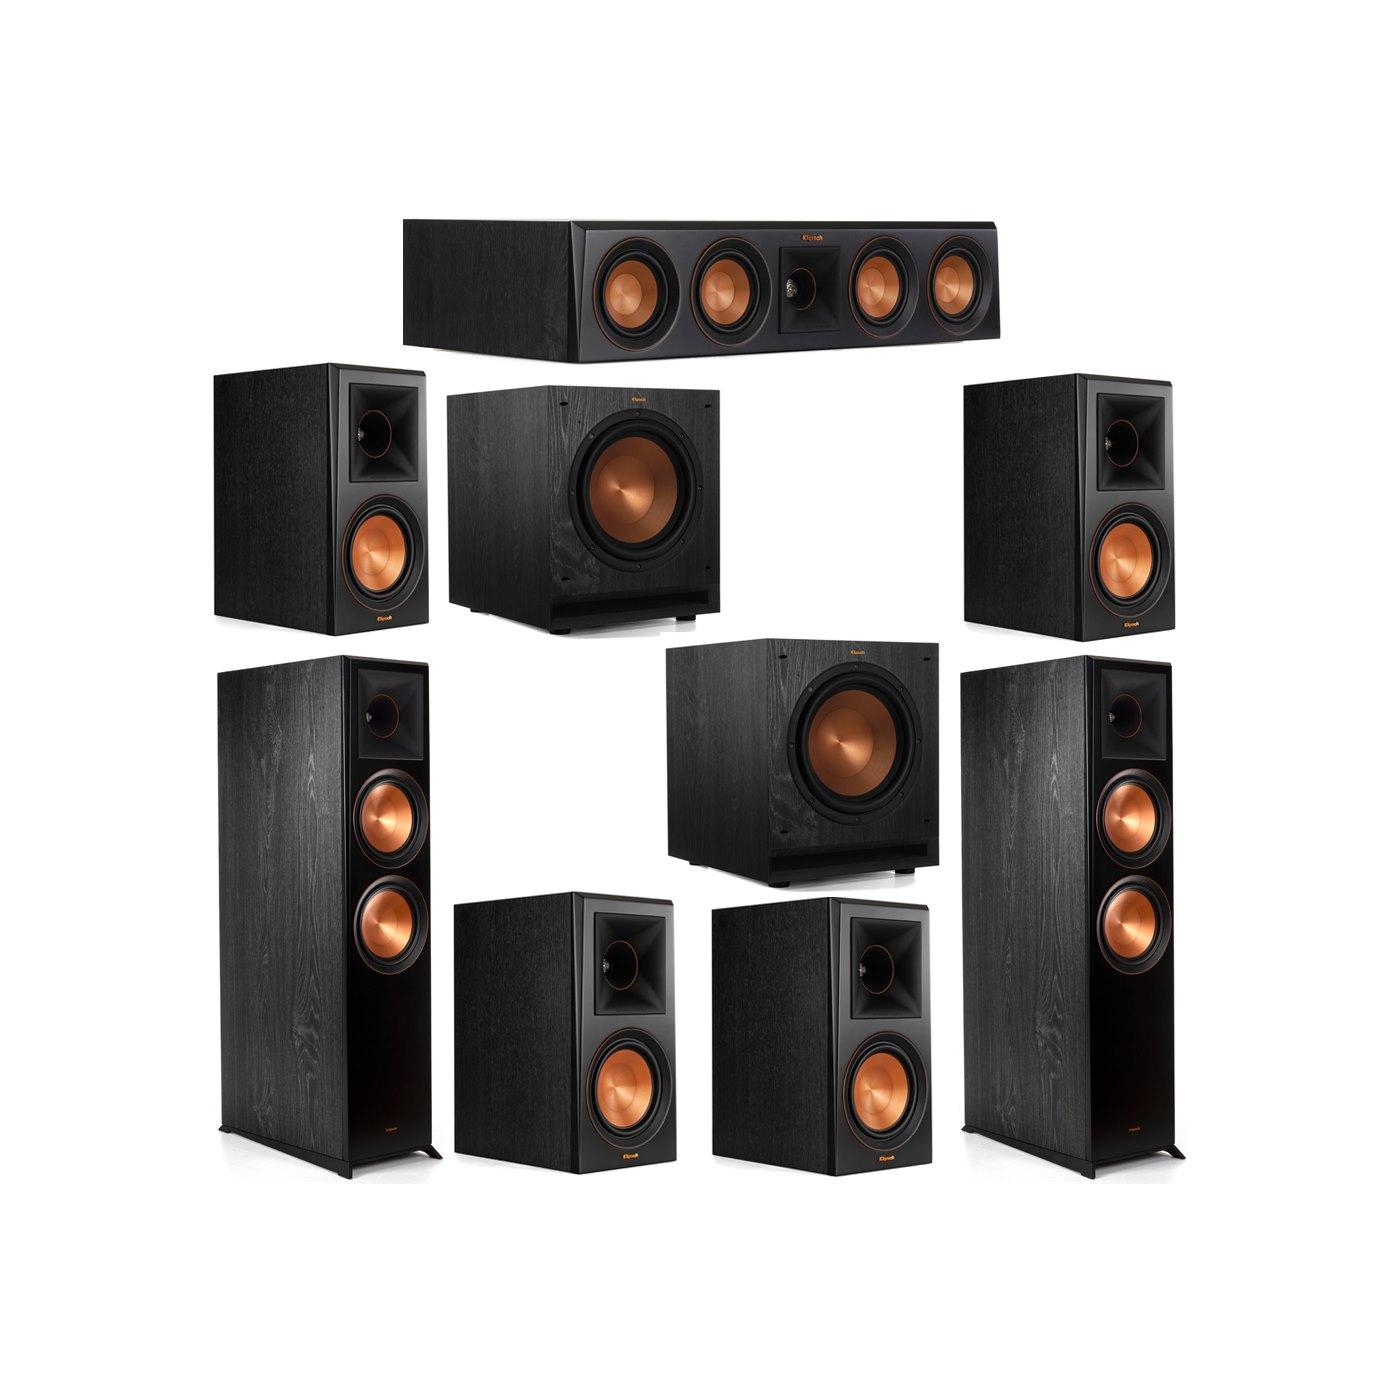 Klipsch 7.2 System with 2 RP-8000F Floorstanding Speakers, 1 Klipsch RP-404C Center Speaker, 4 Klipsch RP-600M Surround Speakers, 2 Klipsch SPL-100 Subwoofers